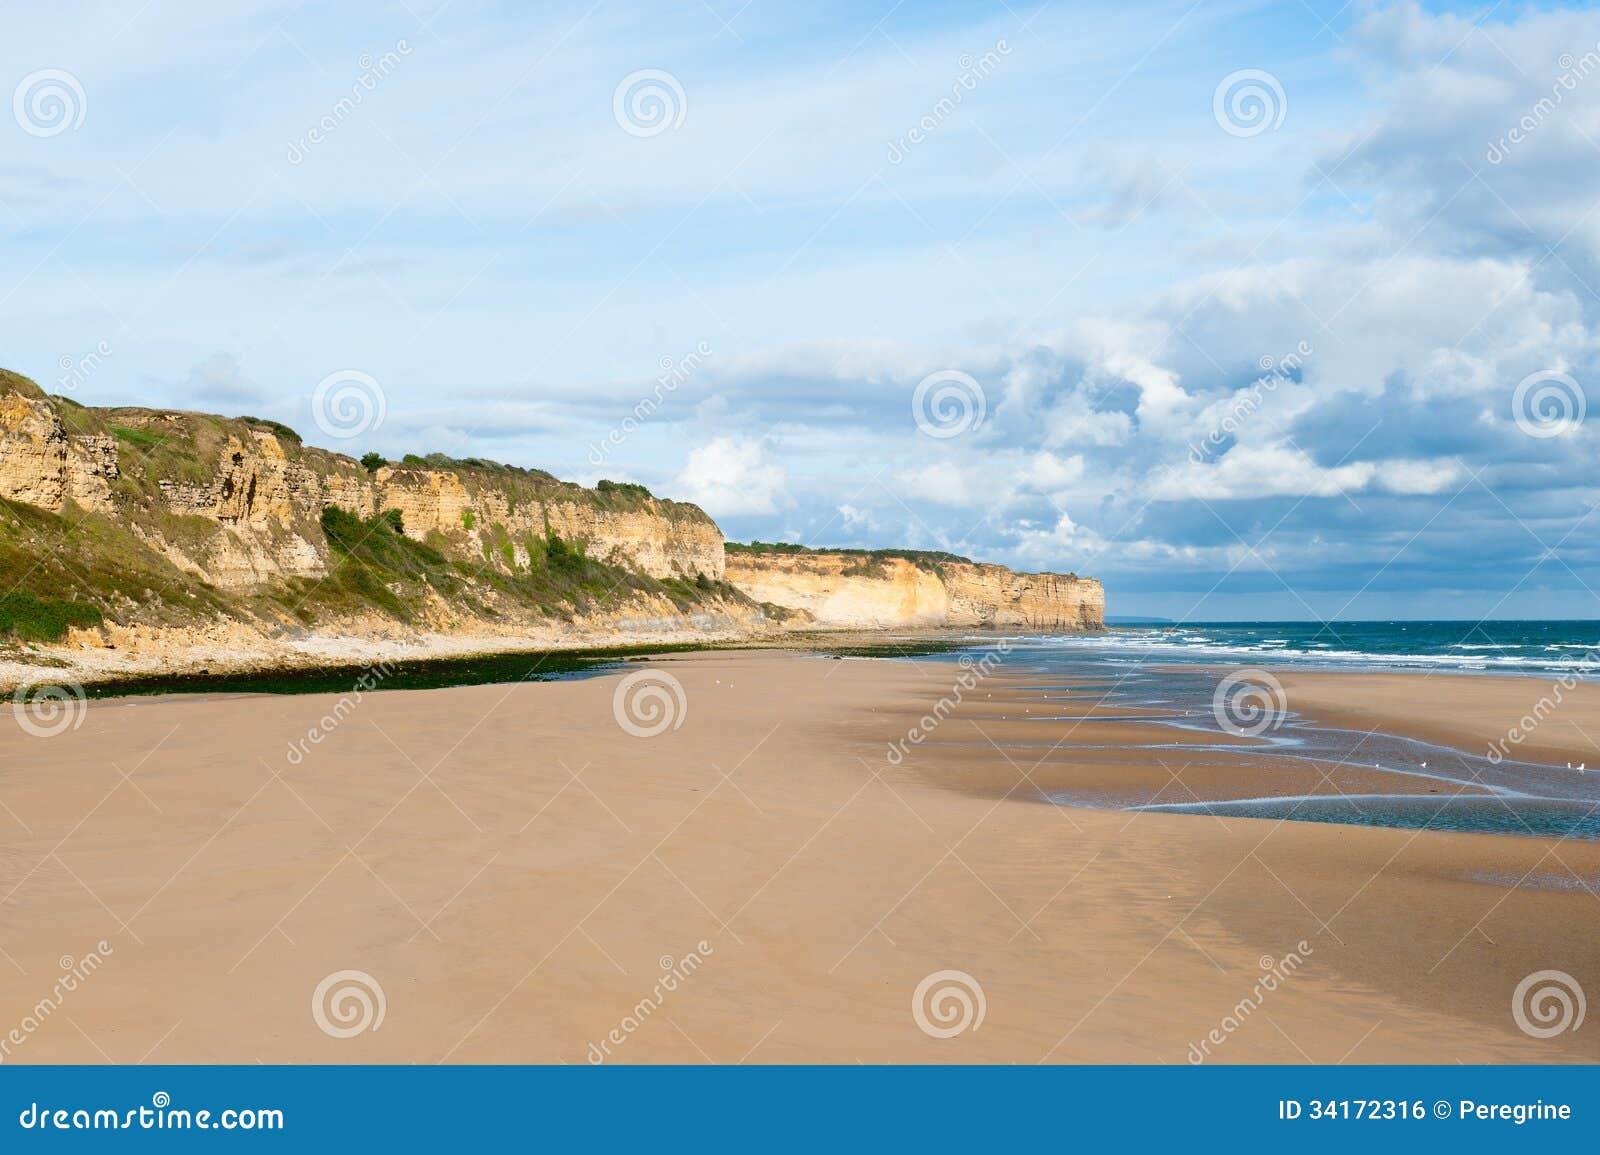 Mercure Hotel Omaha Beach Normandy France